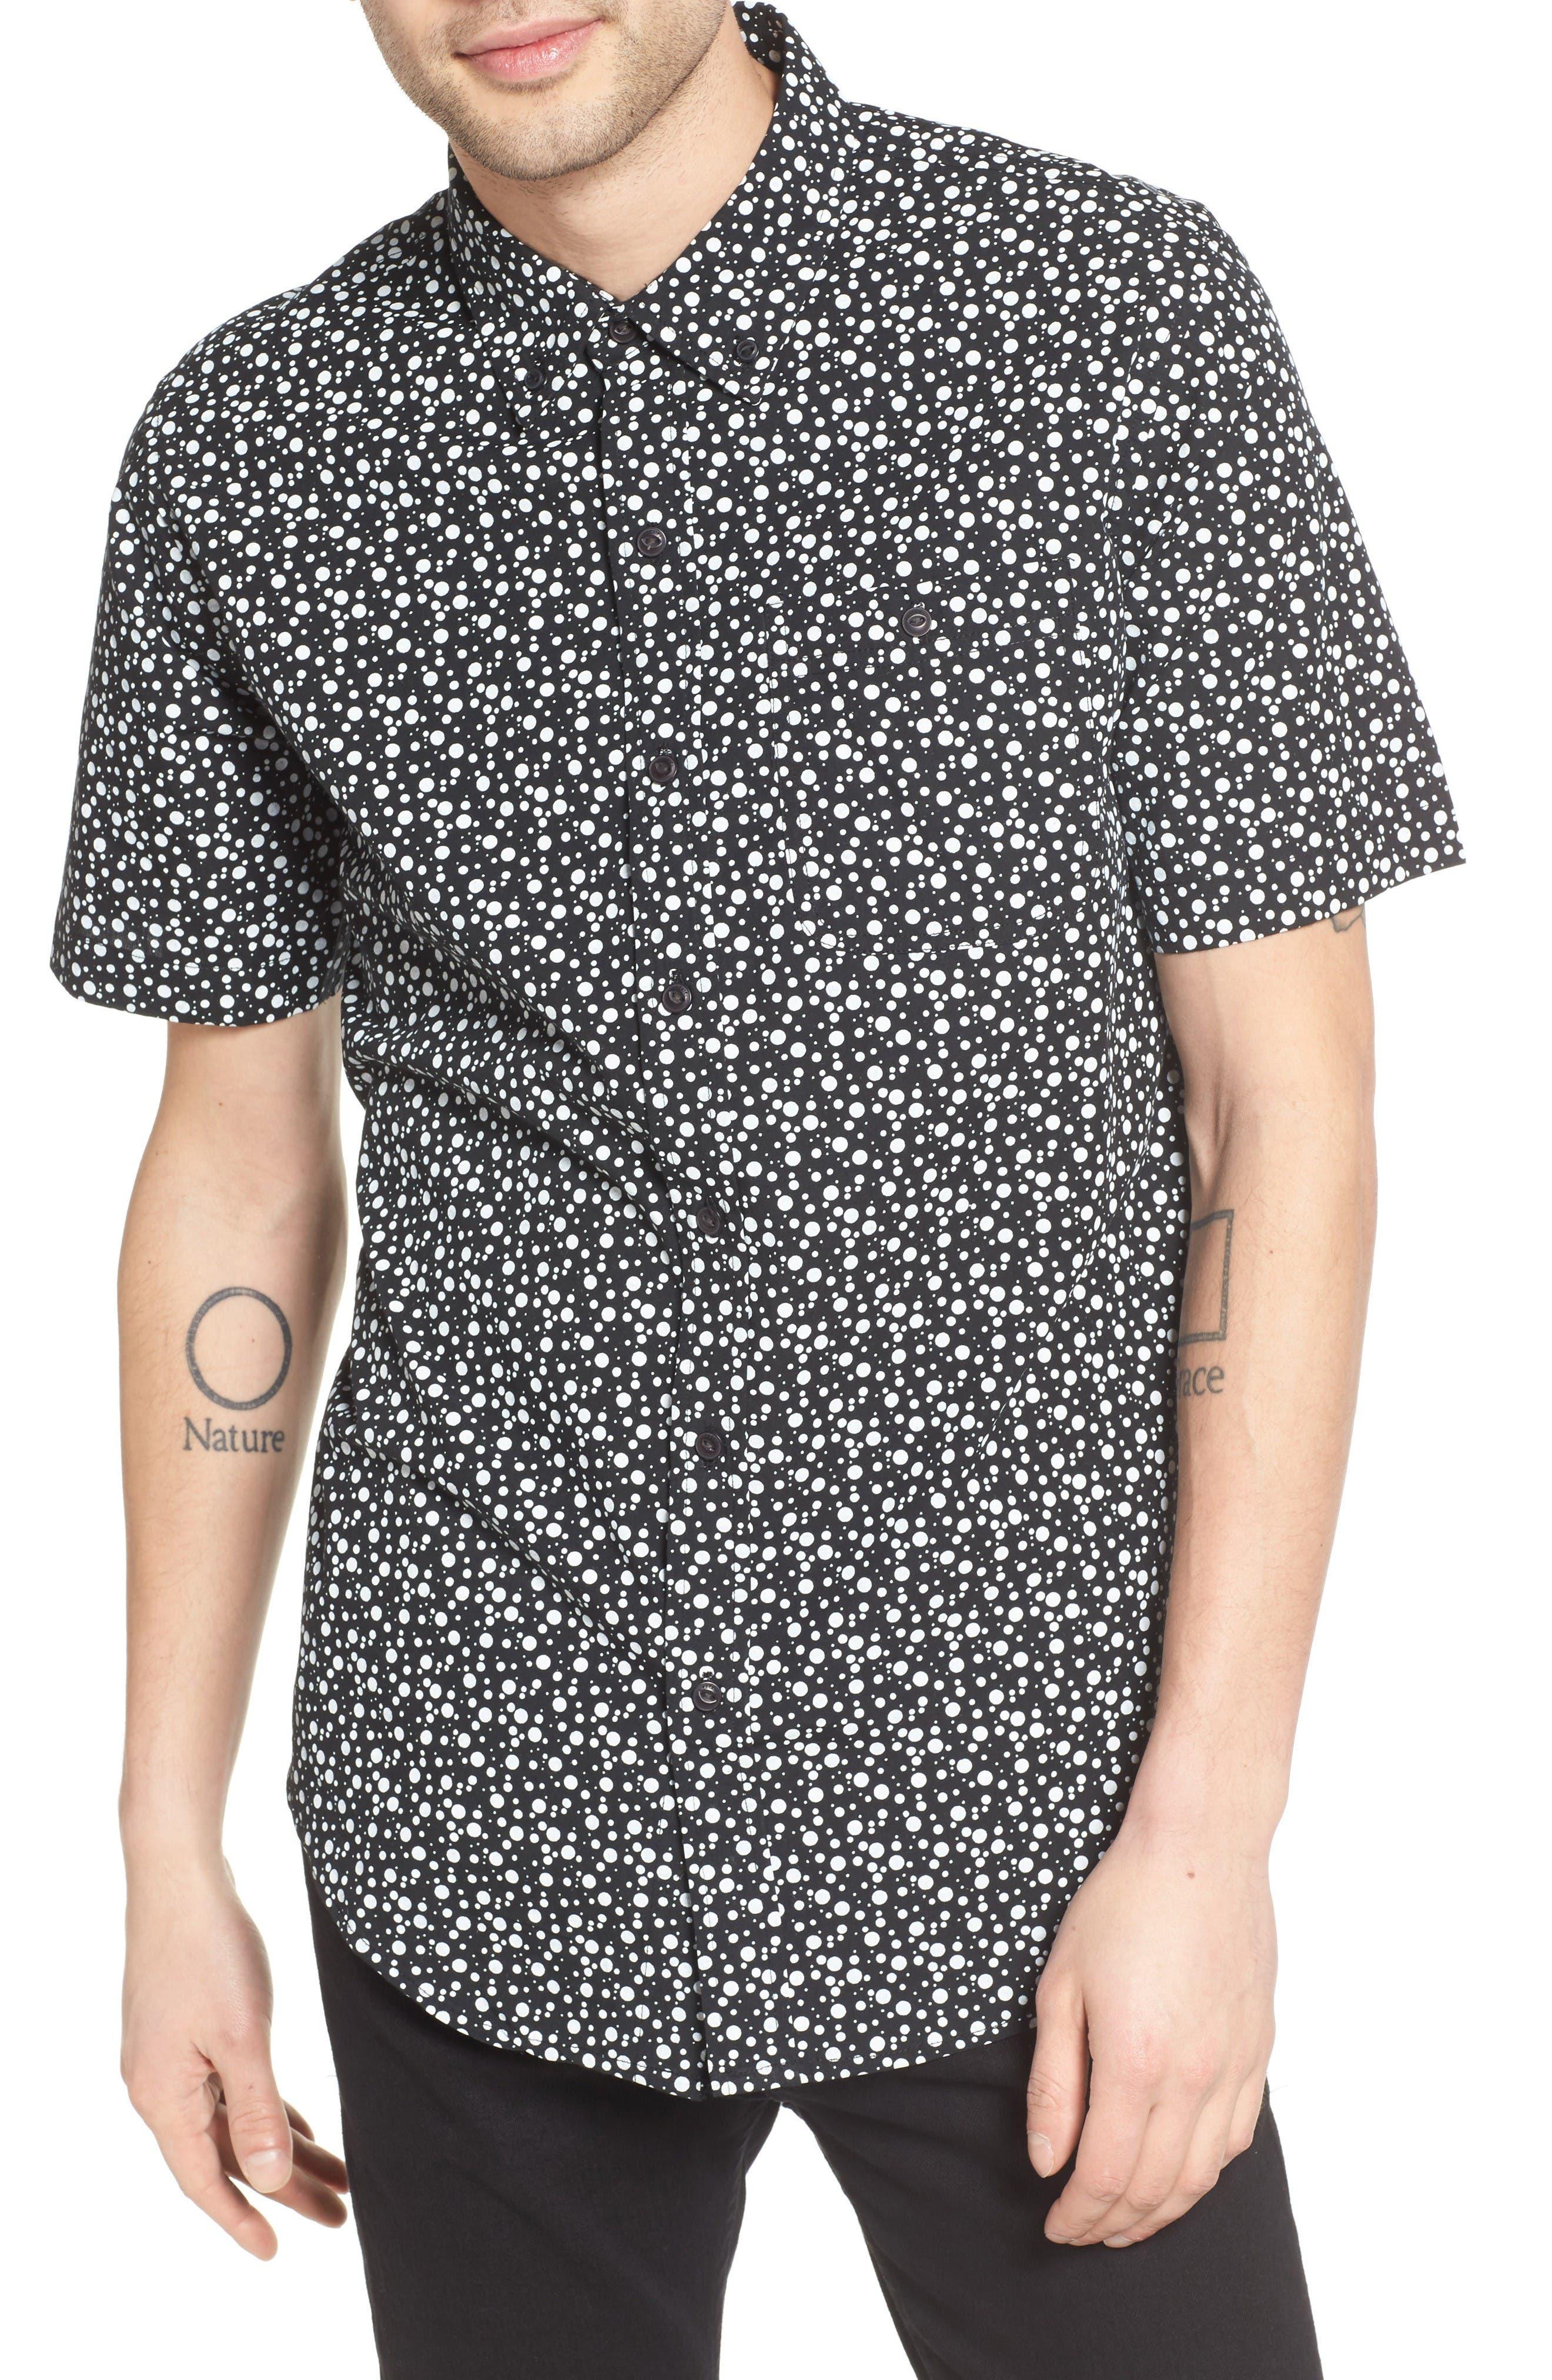 Alternate Image 1 Selected - Ezekiel Bubble Print Woven Shirt